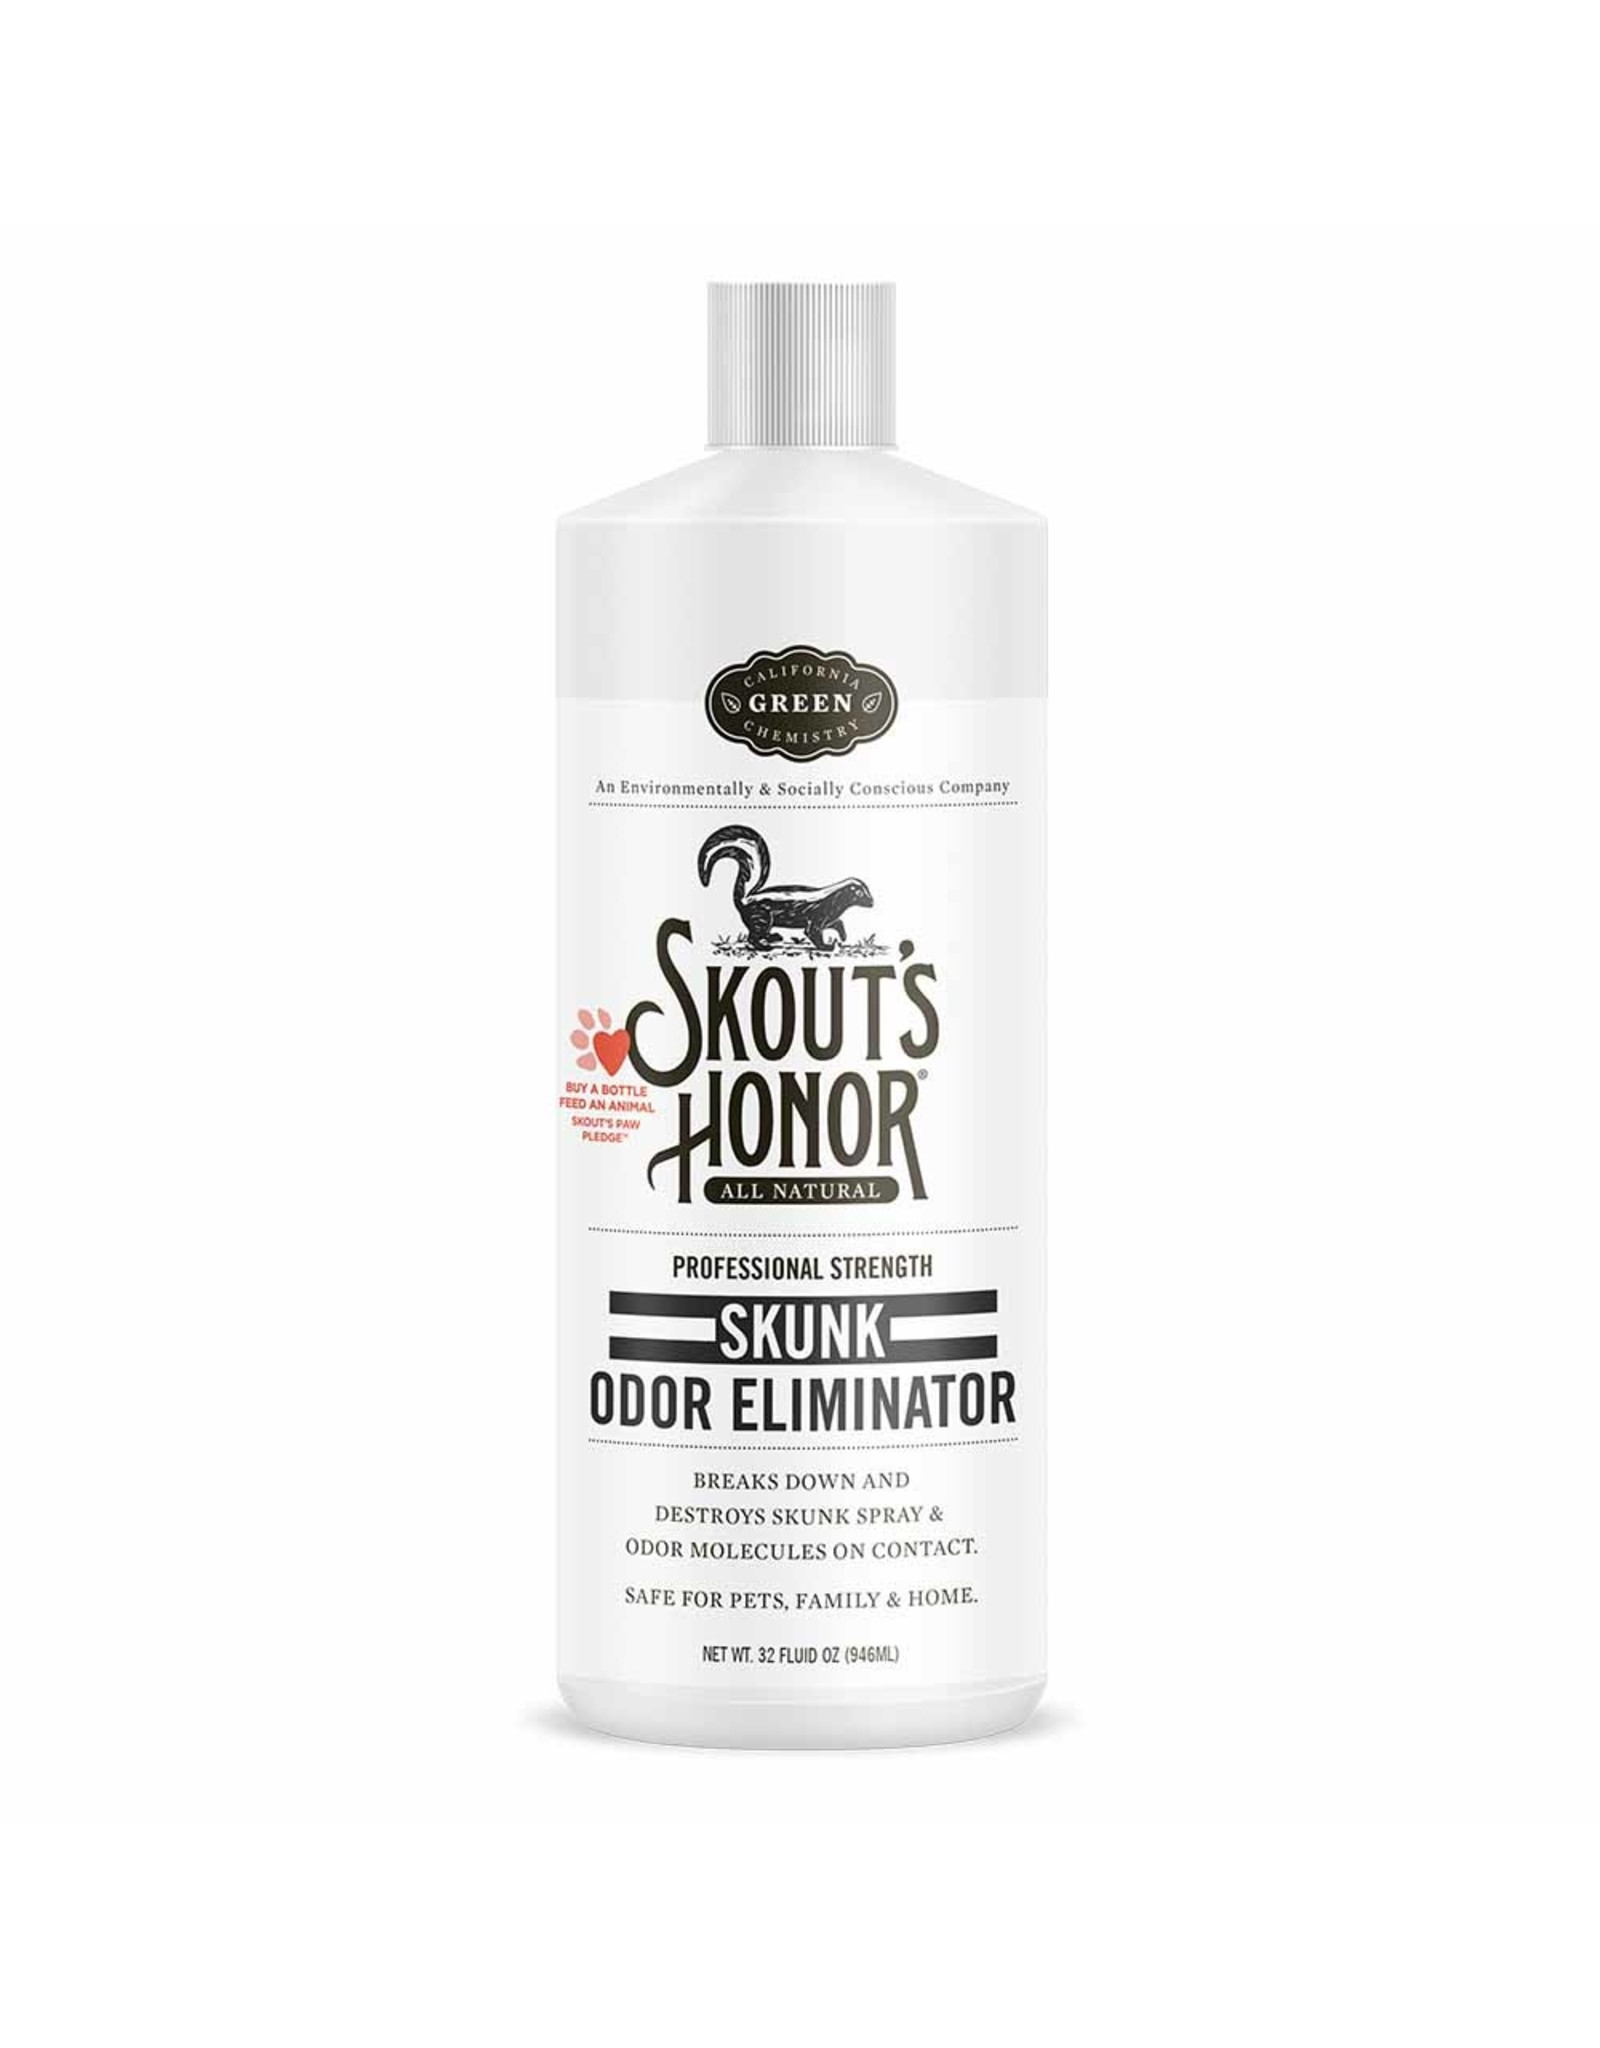 Skout's Honor Skouts Skunk Odor Eliminator 32oz